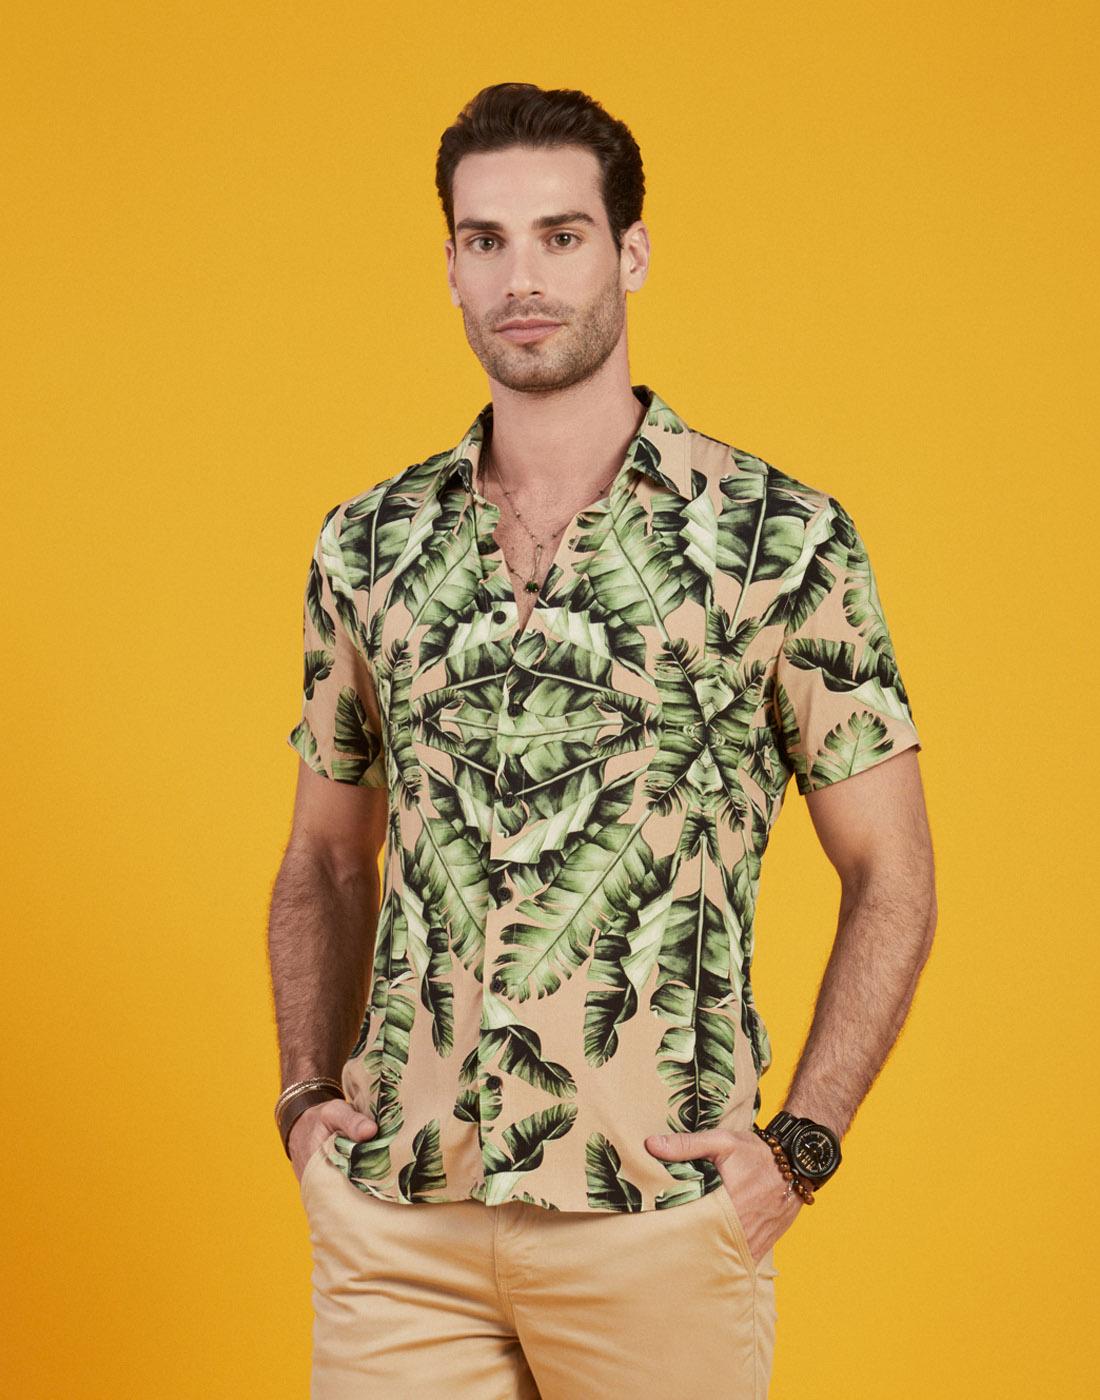 Camisa Masc. Manga Curta Estampa Tropical Six One